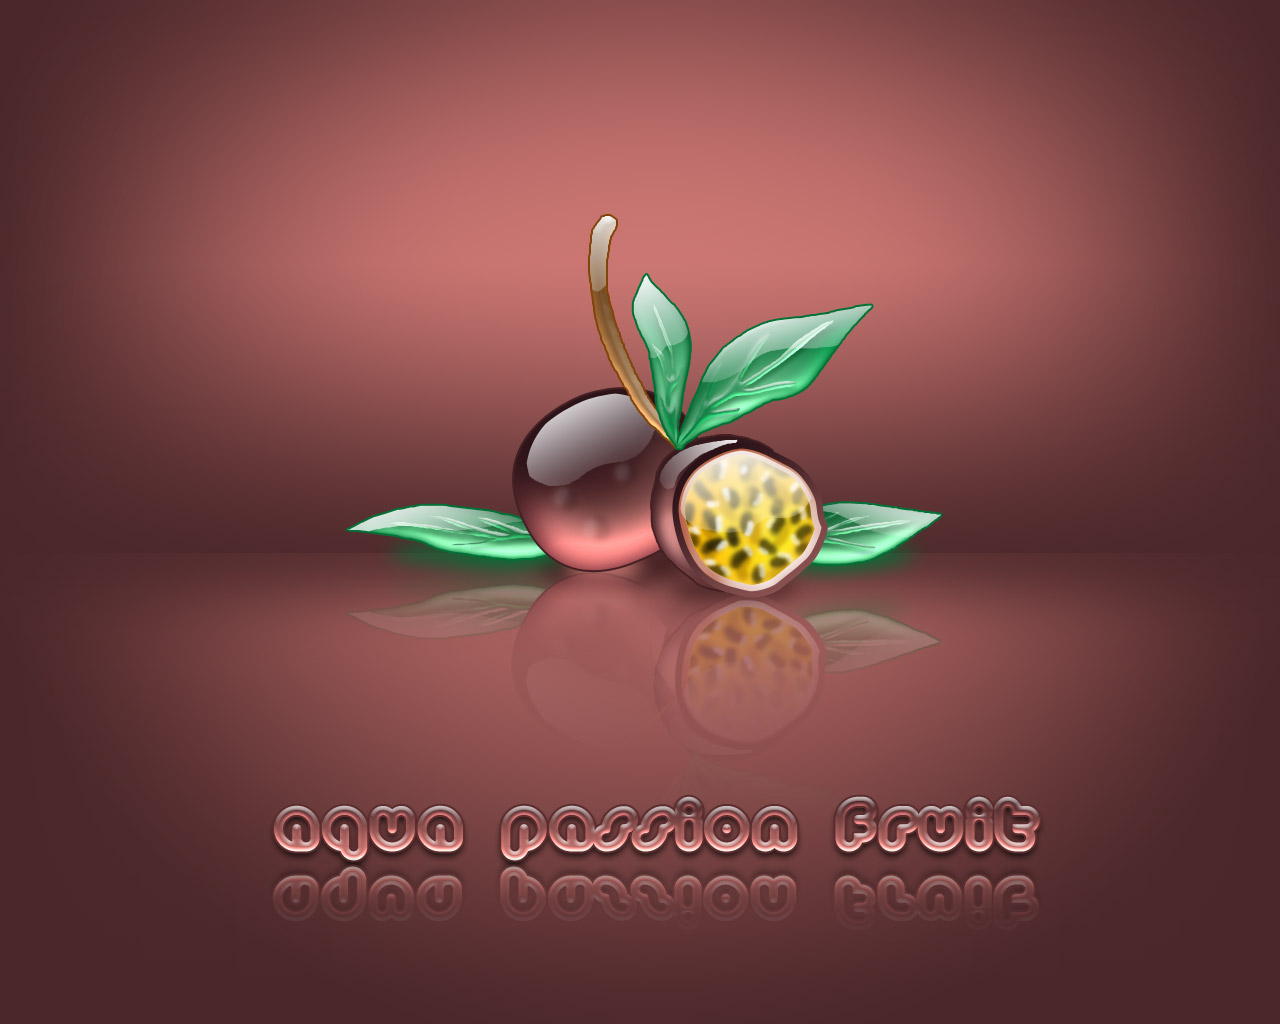 http://4.bp.blogspot.com/-hm1NXCFQvEU/TmxSdPIfuII/AAAAAAAAFpU/DsGqBASwoDU/s1600/Aqua+Passion+Fruit+01.jpg